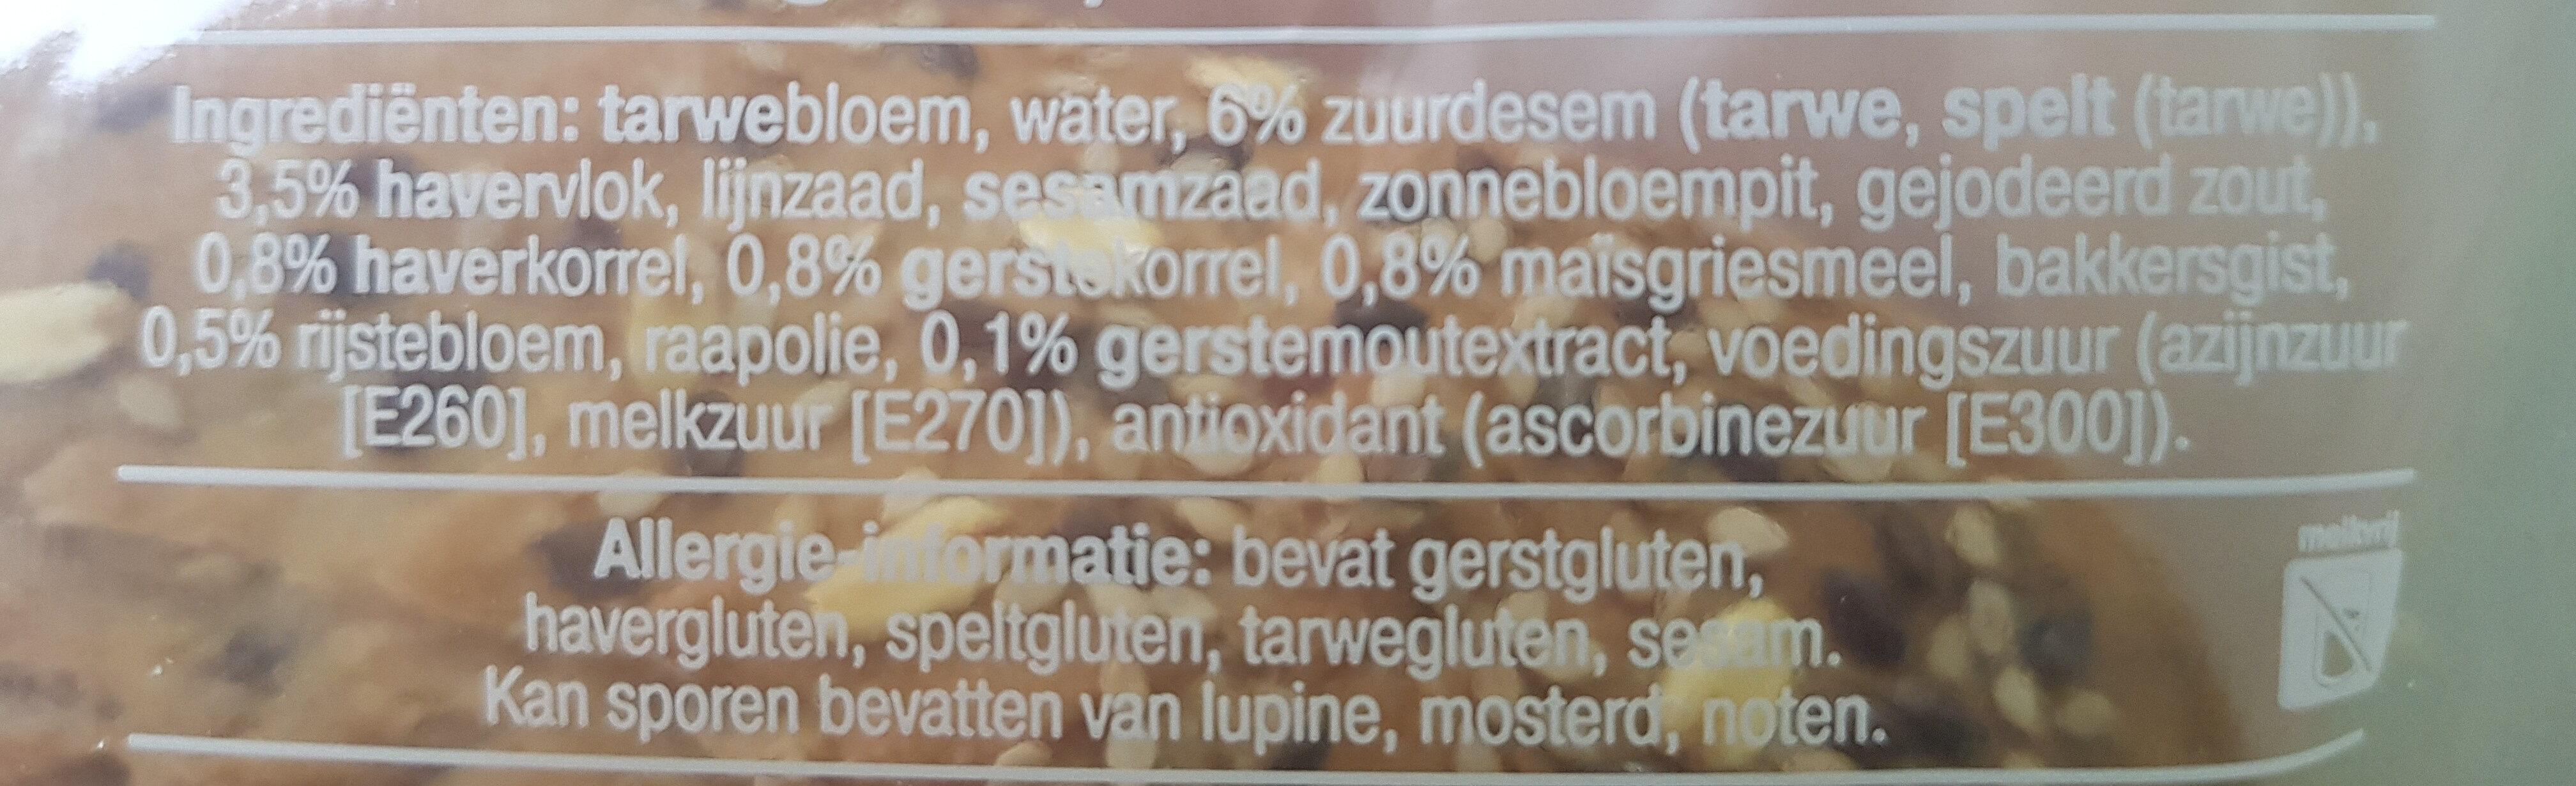 Robuust vloerbrood meergranen - Ingredients - nl